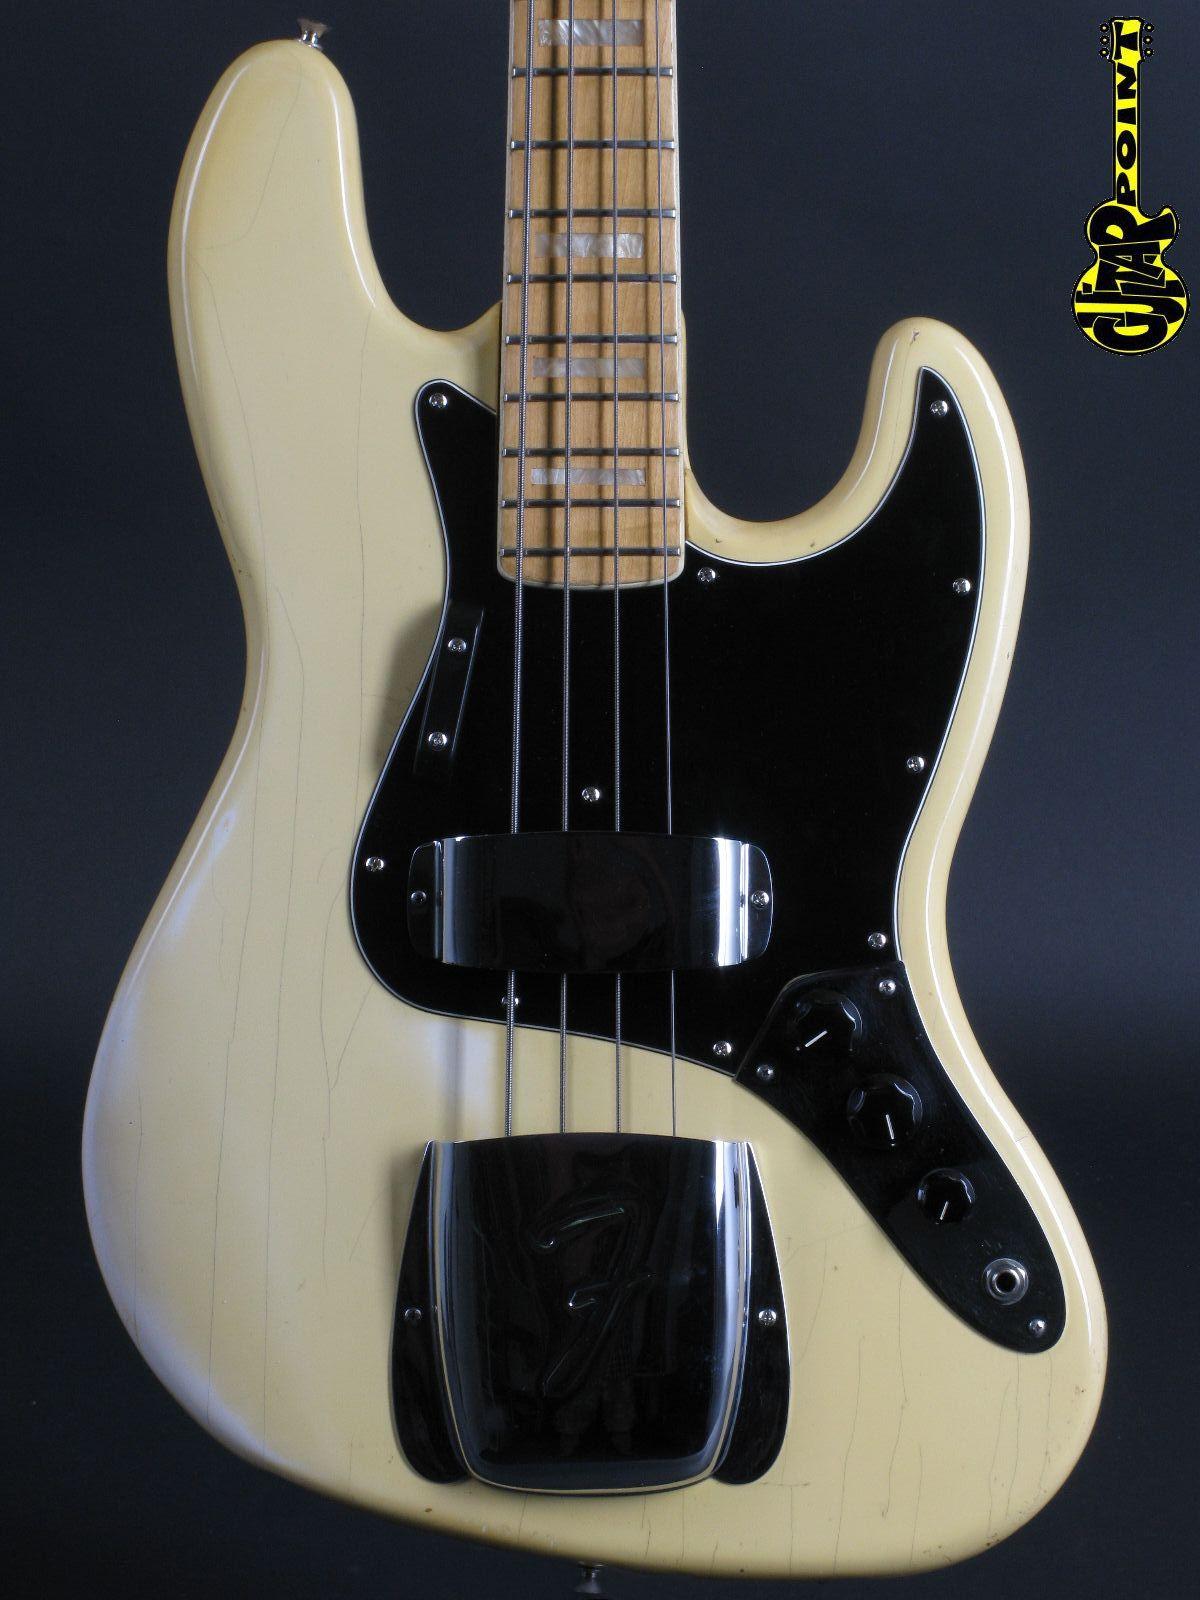 1977 Fender Jazz Bass - Olympic White